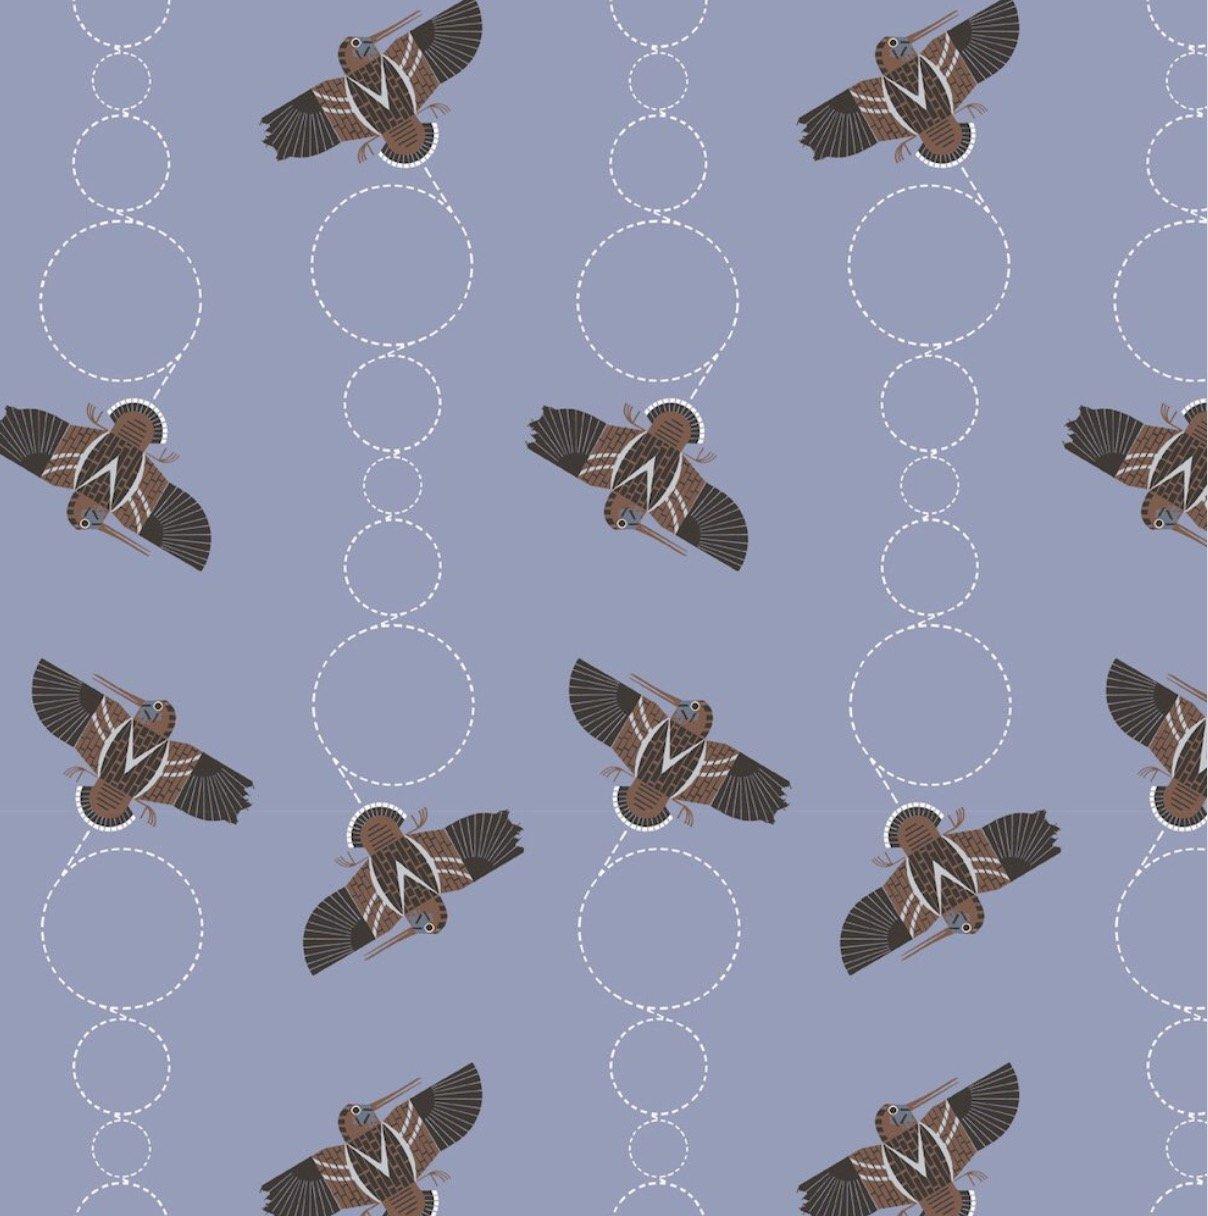 Charley Harper Lakehouse Vol. 1 CH 139 Amorously Airborne